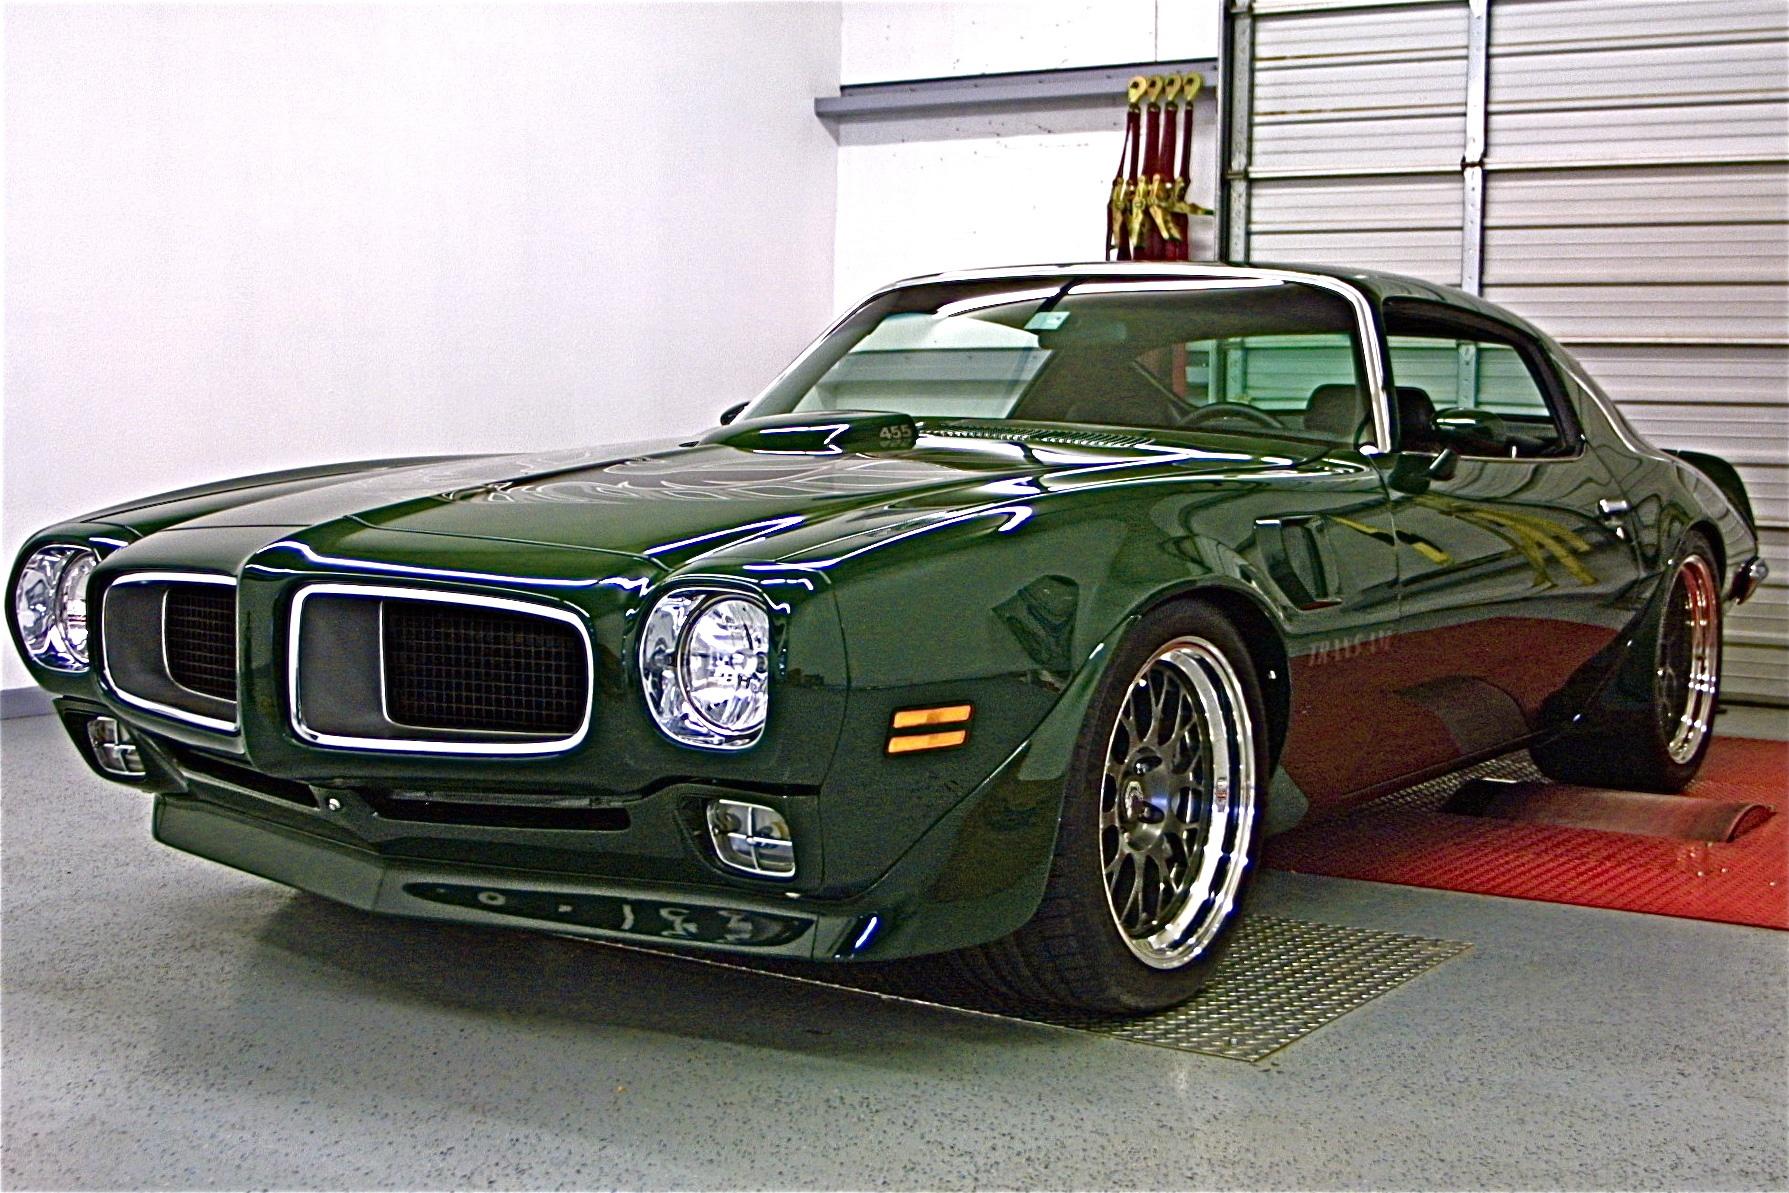 Awesome 70s Pontiac Firebird Trans Am RestoMod